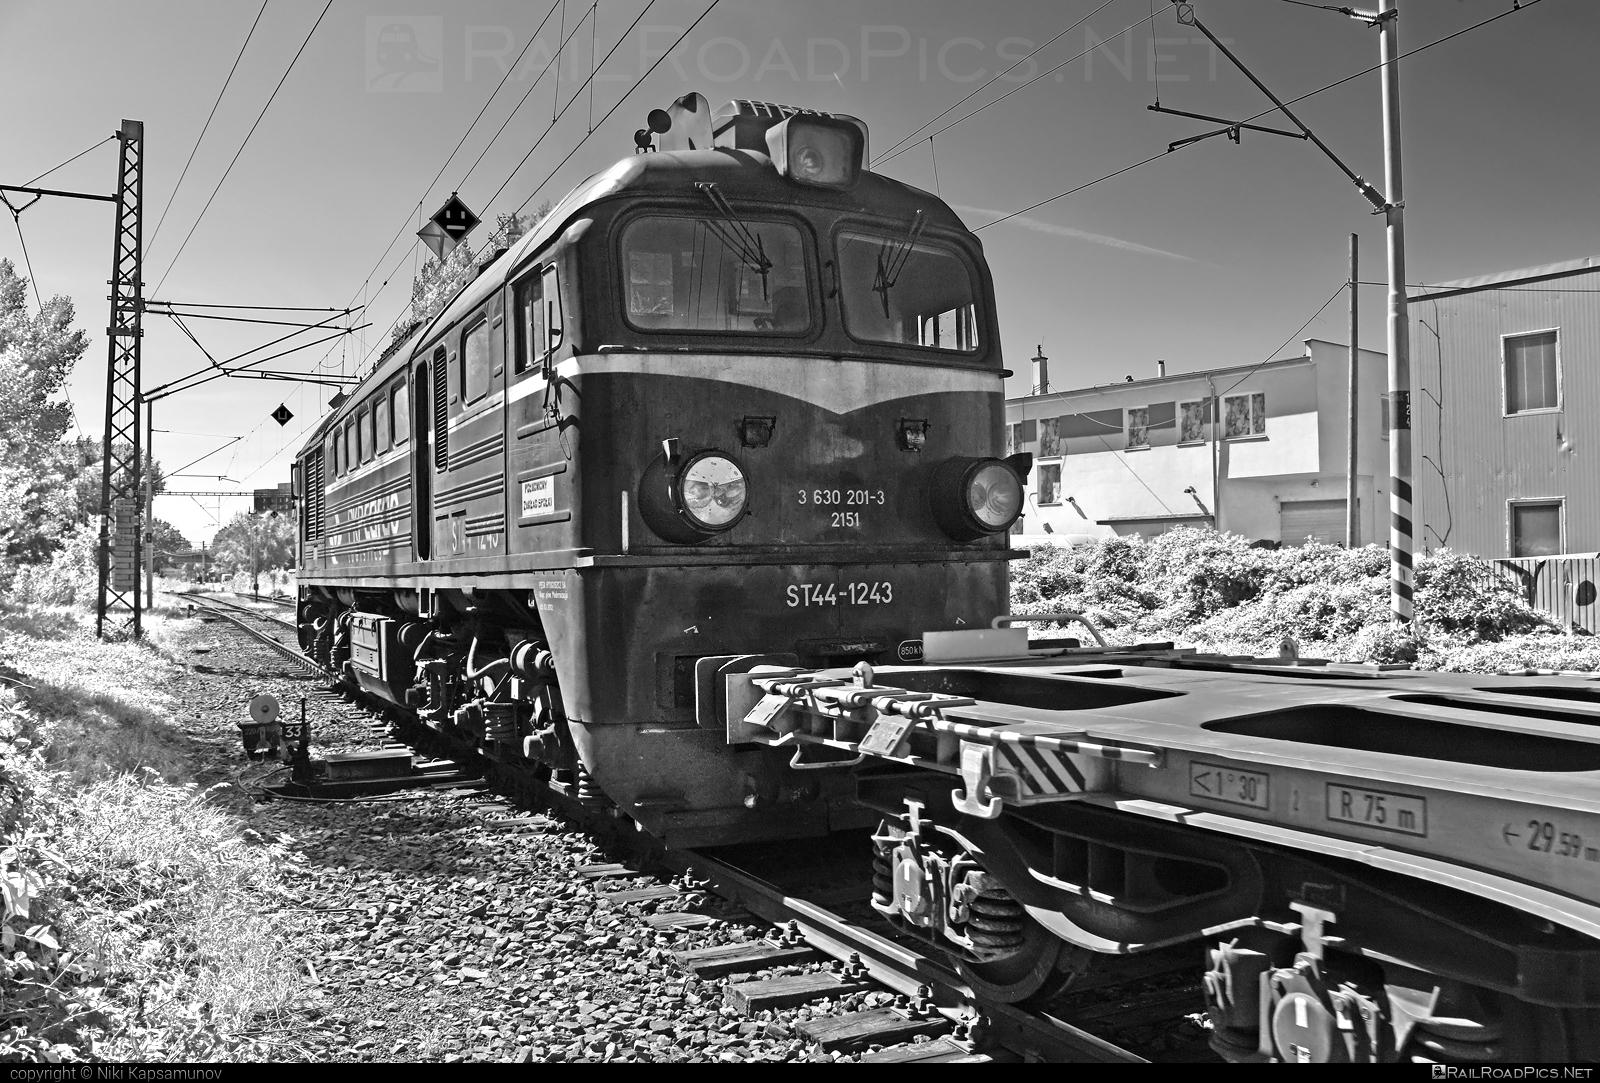 Lugansk M62 - 630 201-3 operated by PKP CARGO INTERNATIONAL a.s. #locomotivem62 #ltz #ltzm62 #lugansk #luganskteplovoz #luhansklocomotiveworks #luhanskm62 #luhanskteplovoz #m62 #m62locomotive #pkp #pkpcargo #pkpcargointernational #pkpcargointernationalas #pkpcargospolkaakcyjna #pkpci #sergej